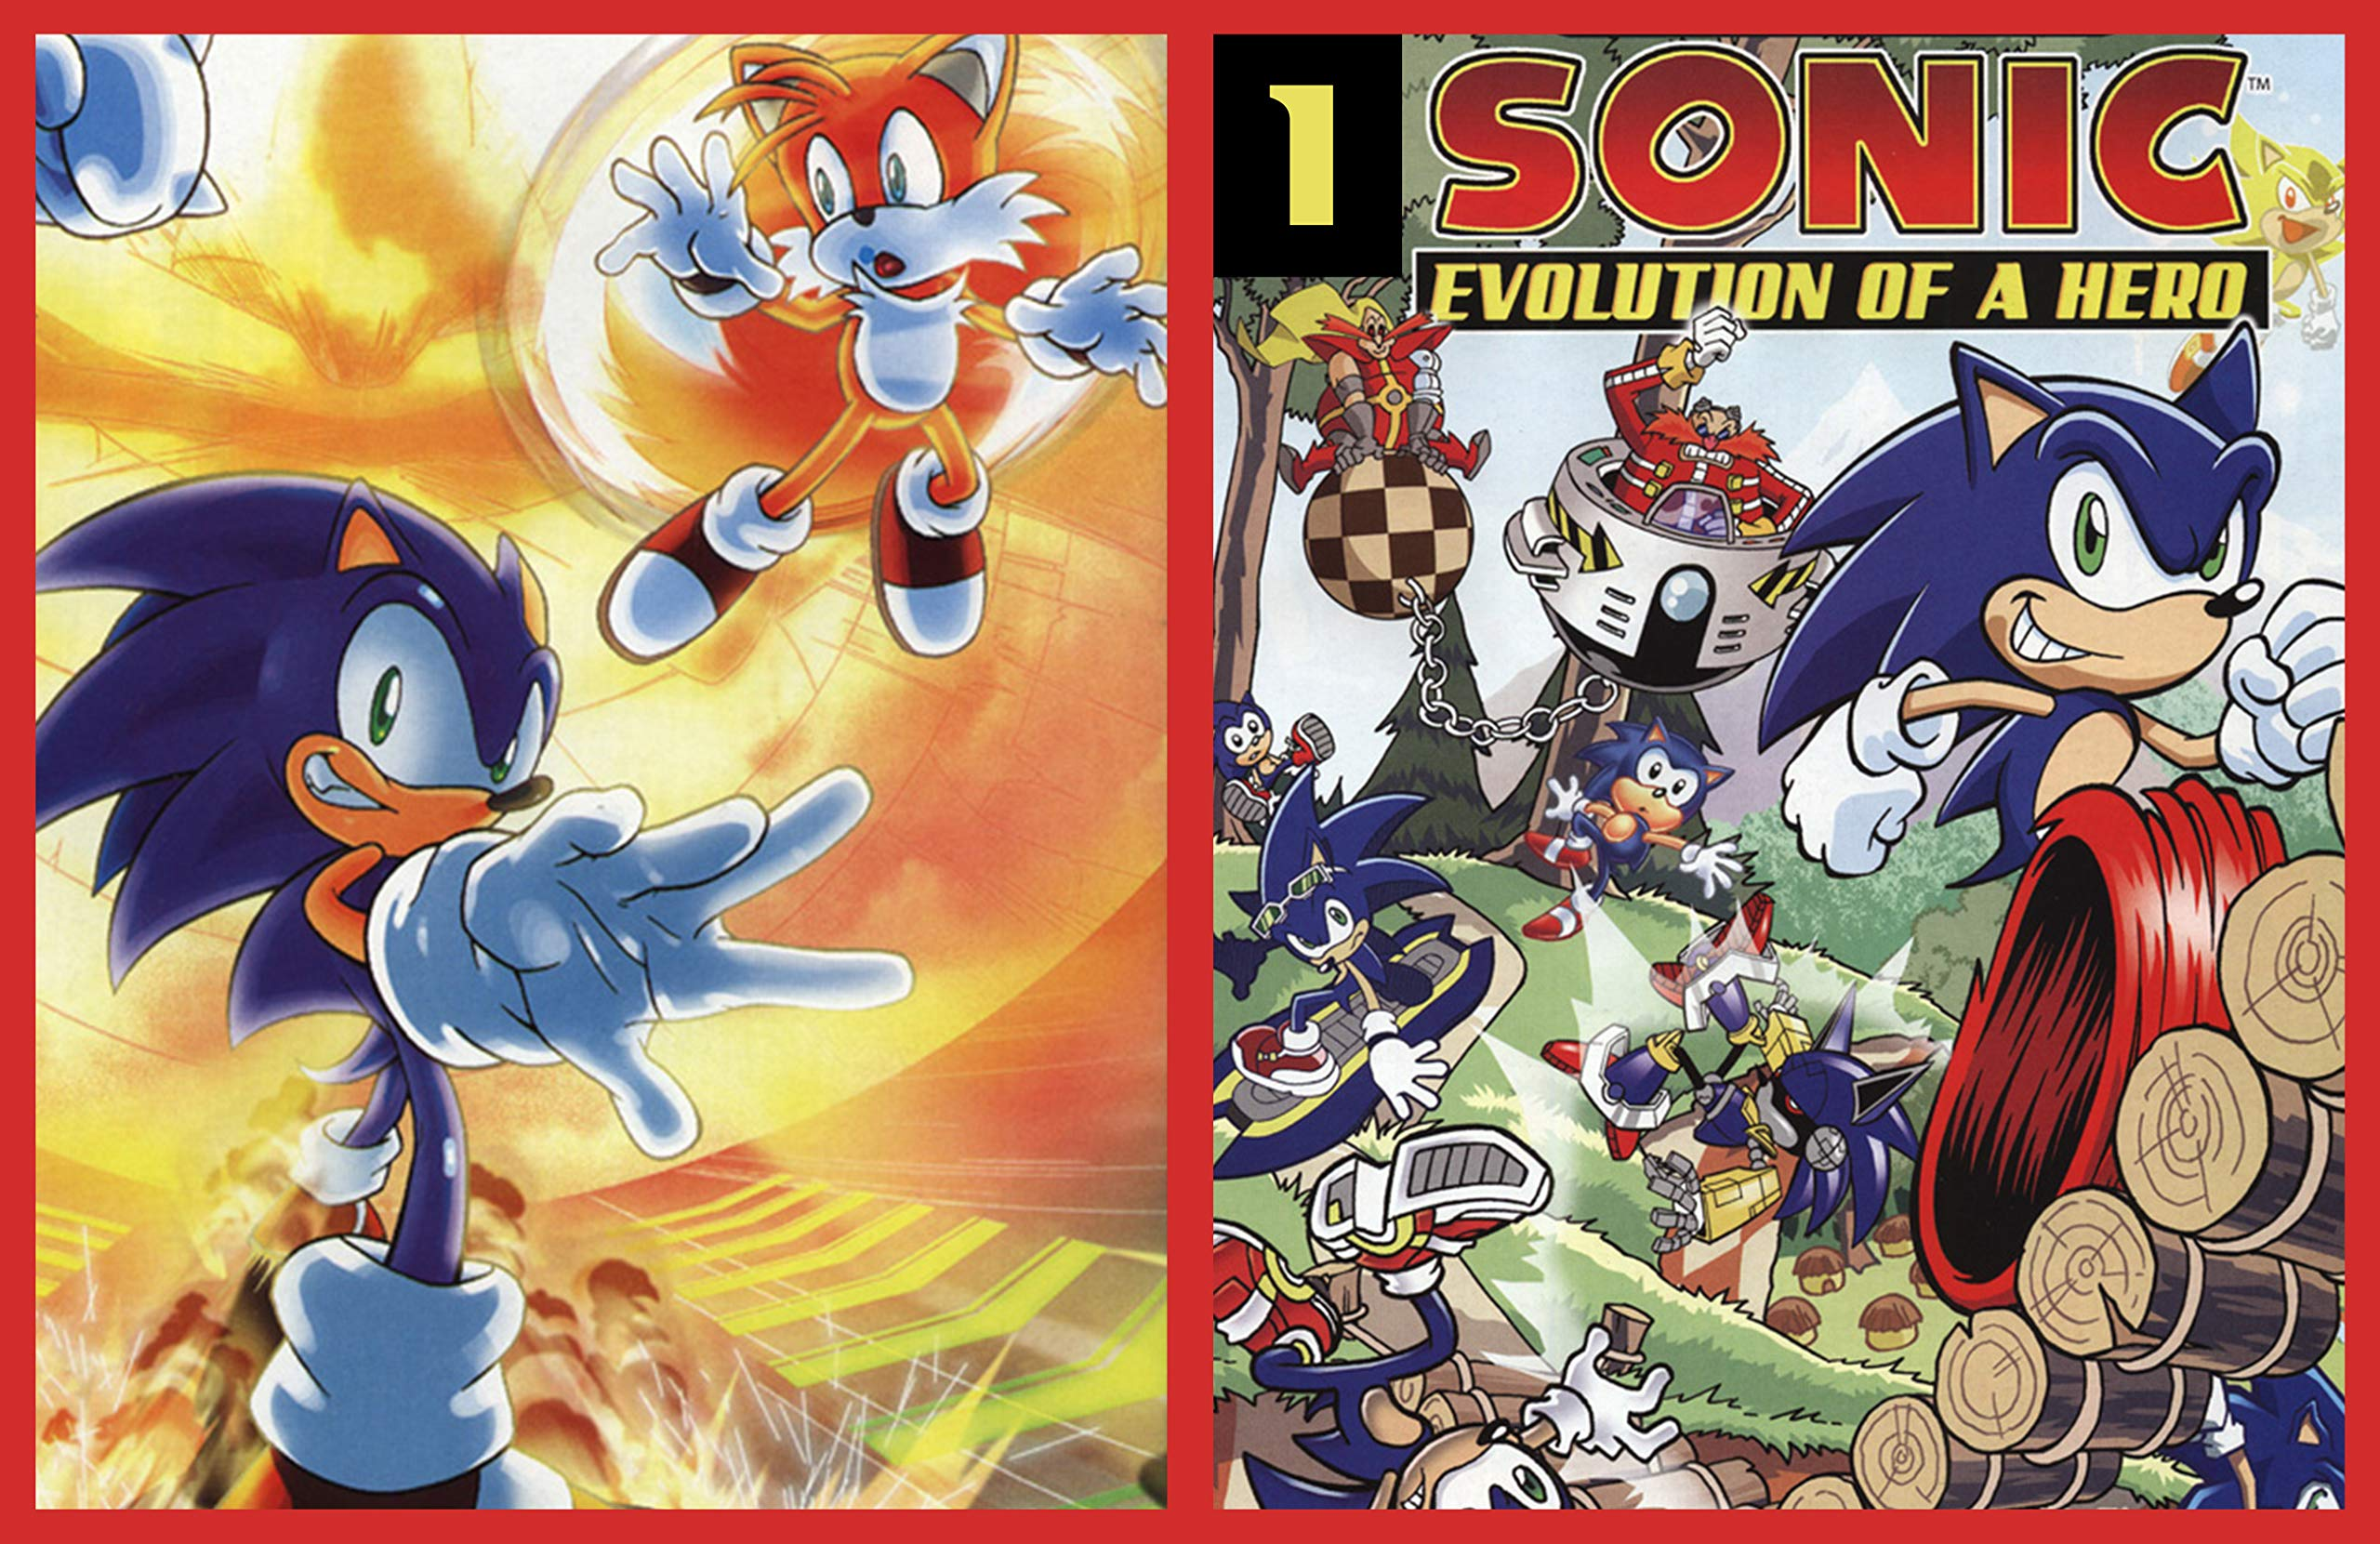 Sonic: The Hedgehog Sonic Free Comic Book #1